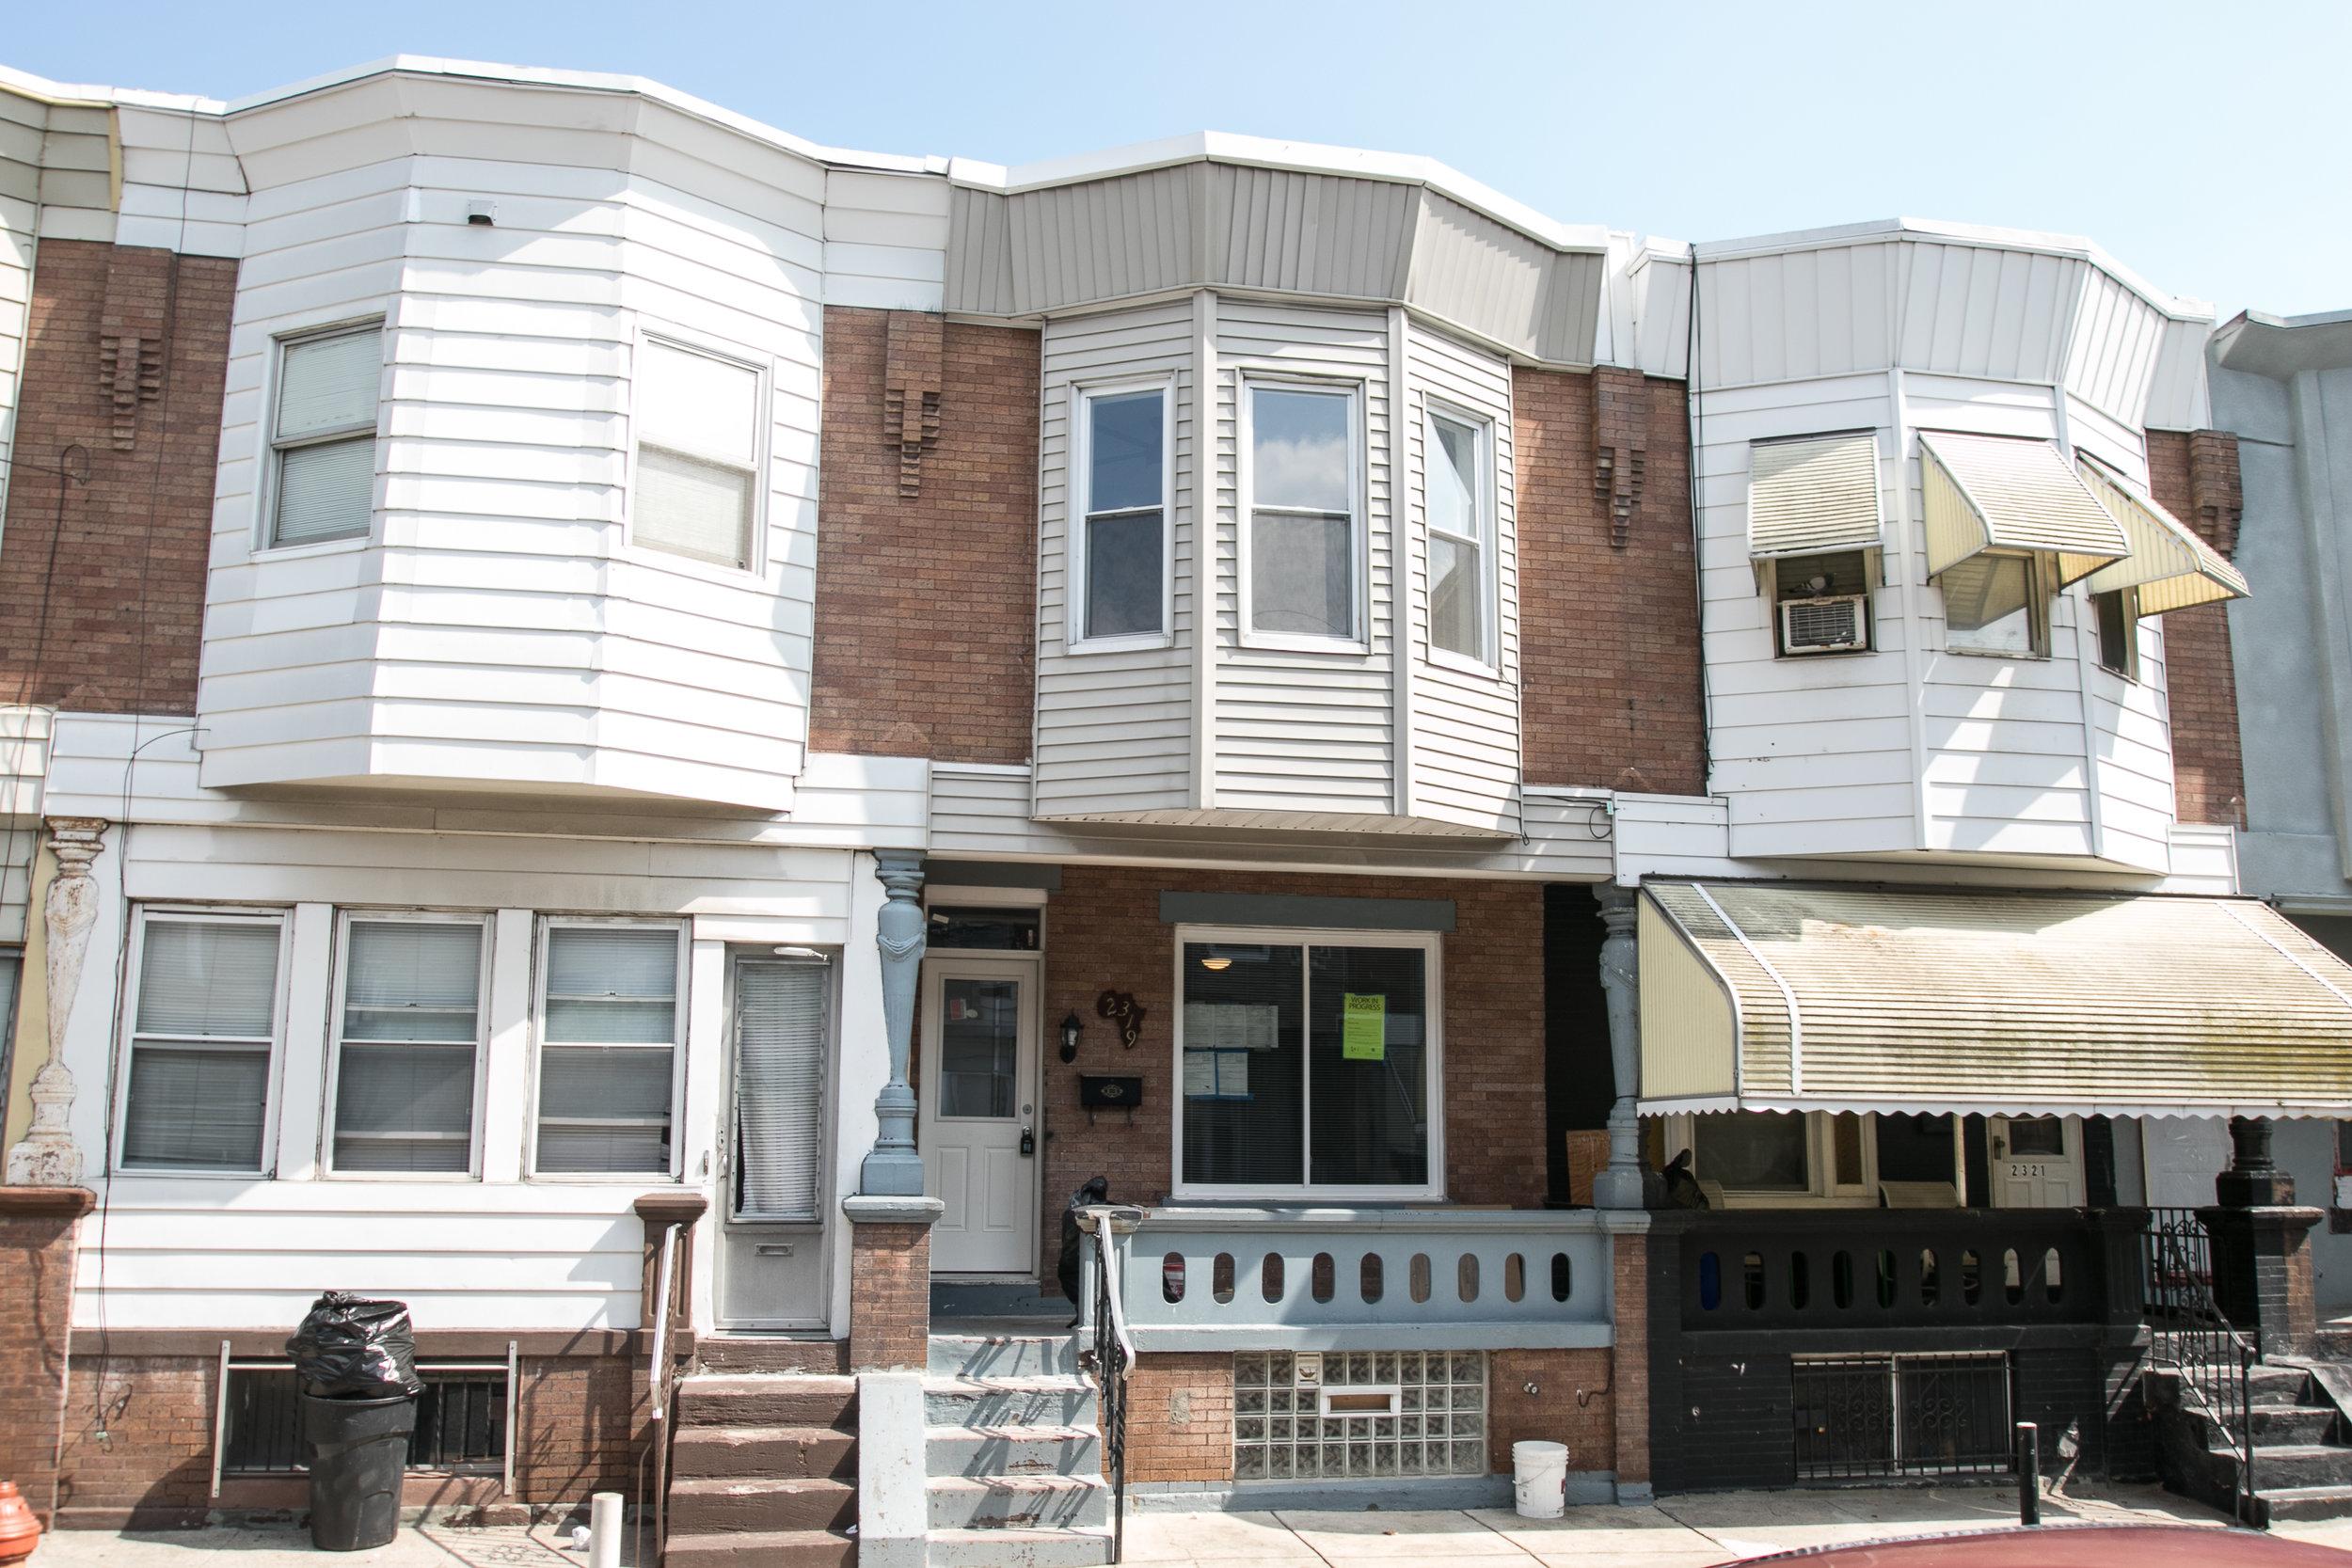 Rented | 2319 South Hemberger Street - West Passyunk, Philadelphia, PA, 19145